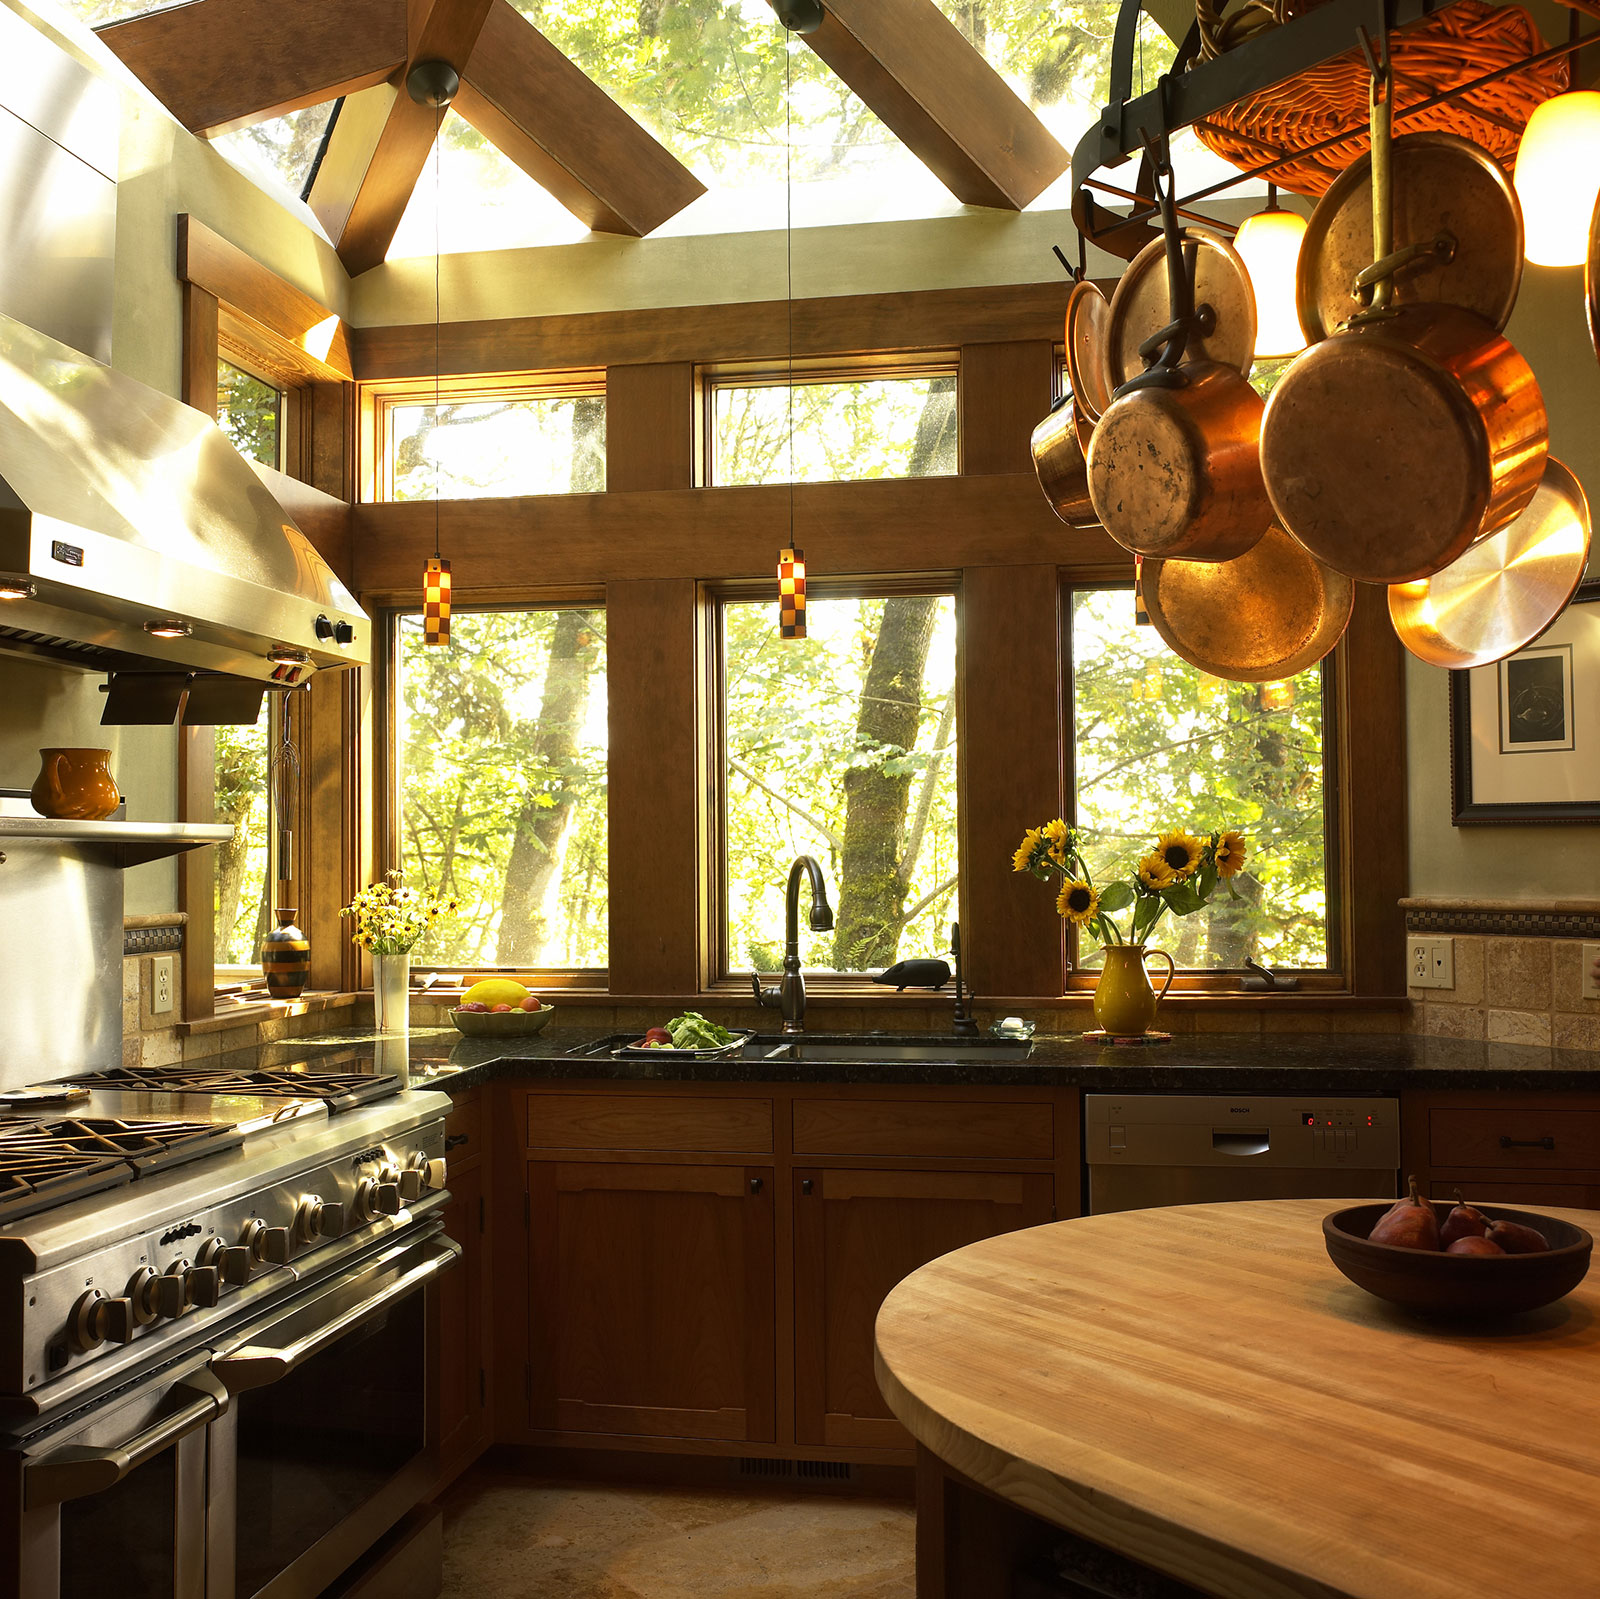 Kitchen remodel ideas eugene oregon gallery arubaitofo Choice Image